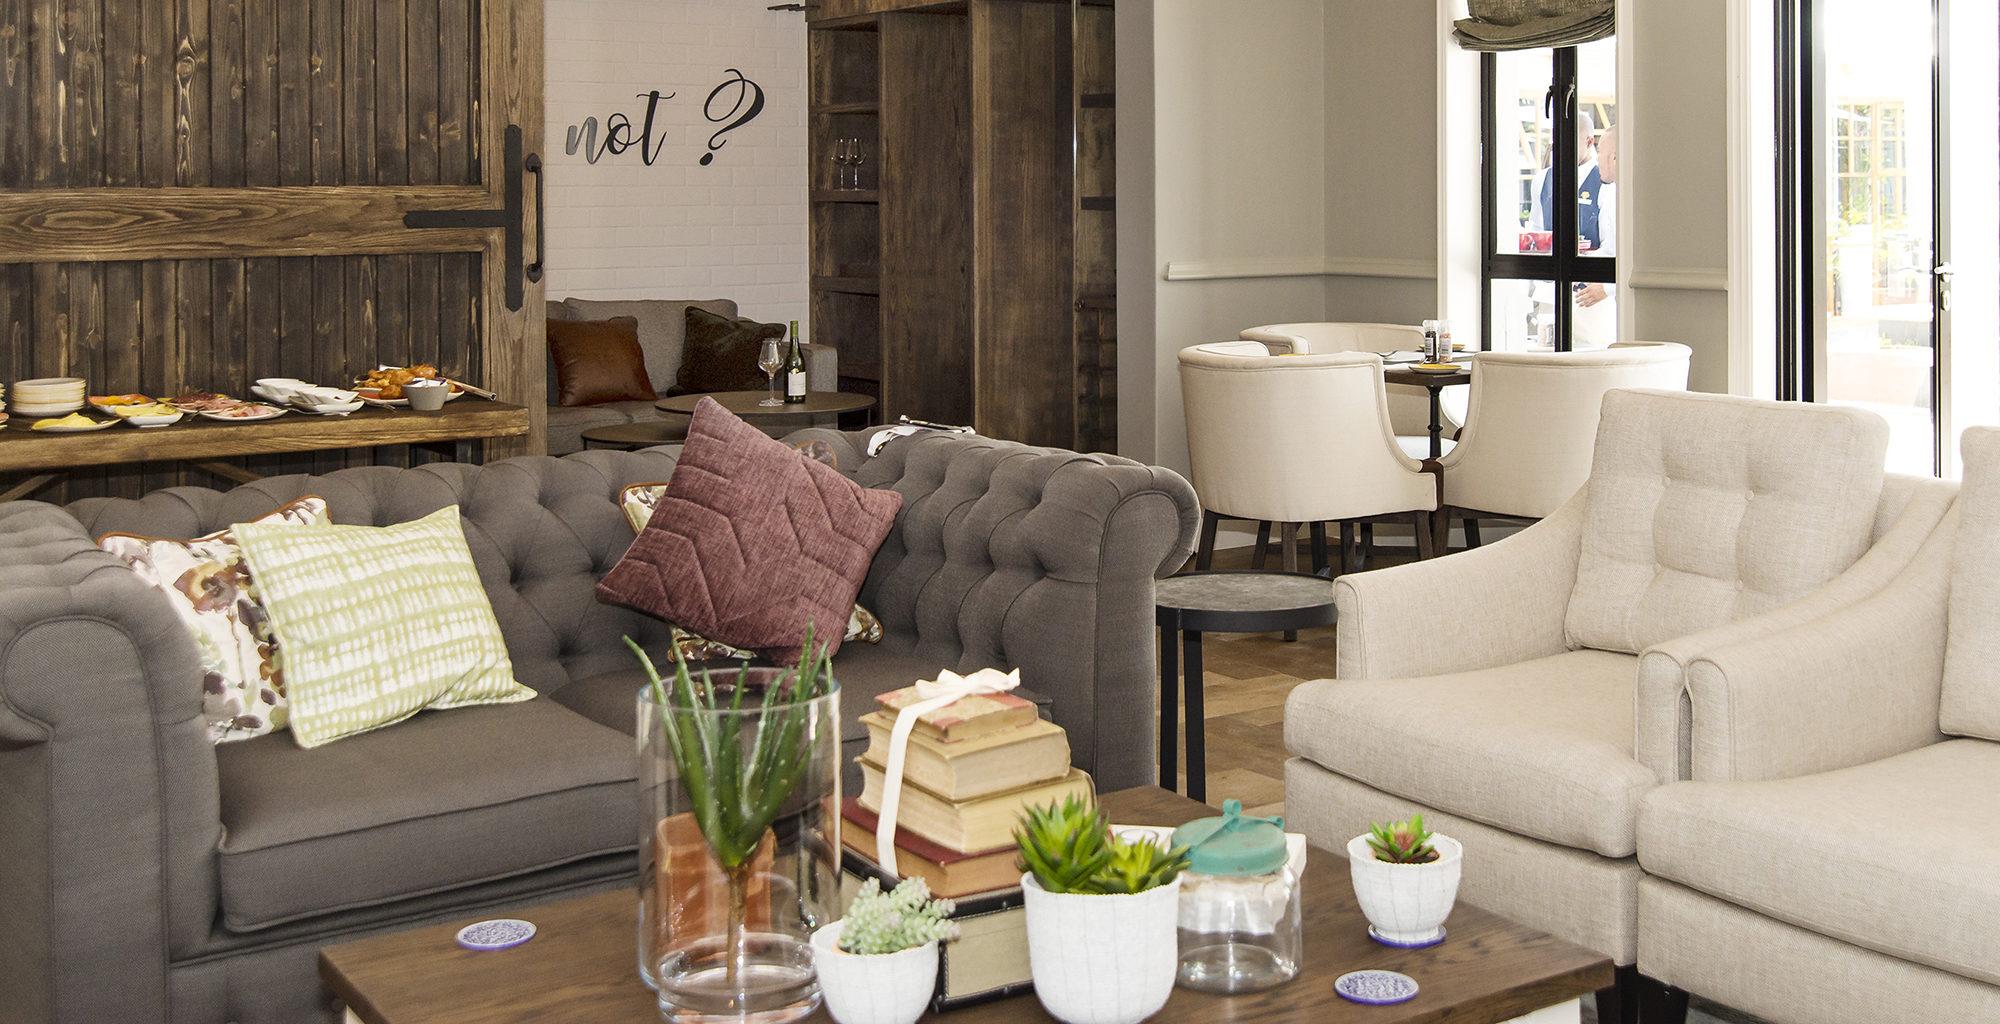 Namibia-Am-Weinberg-Boutique-Hotel-Lounge